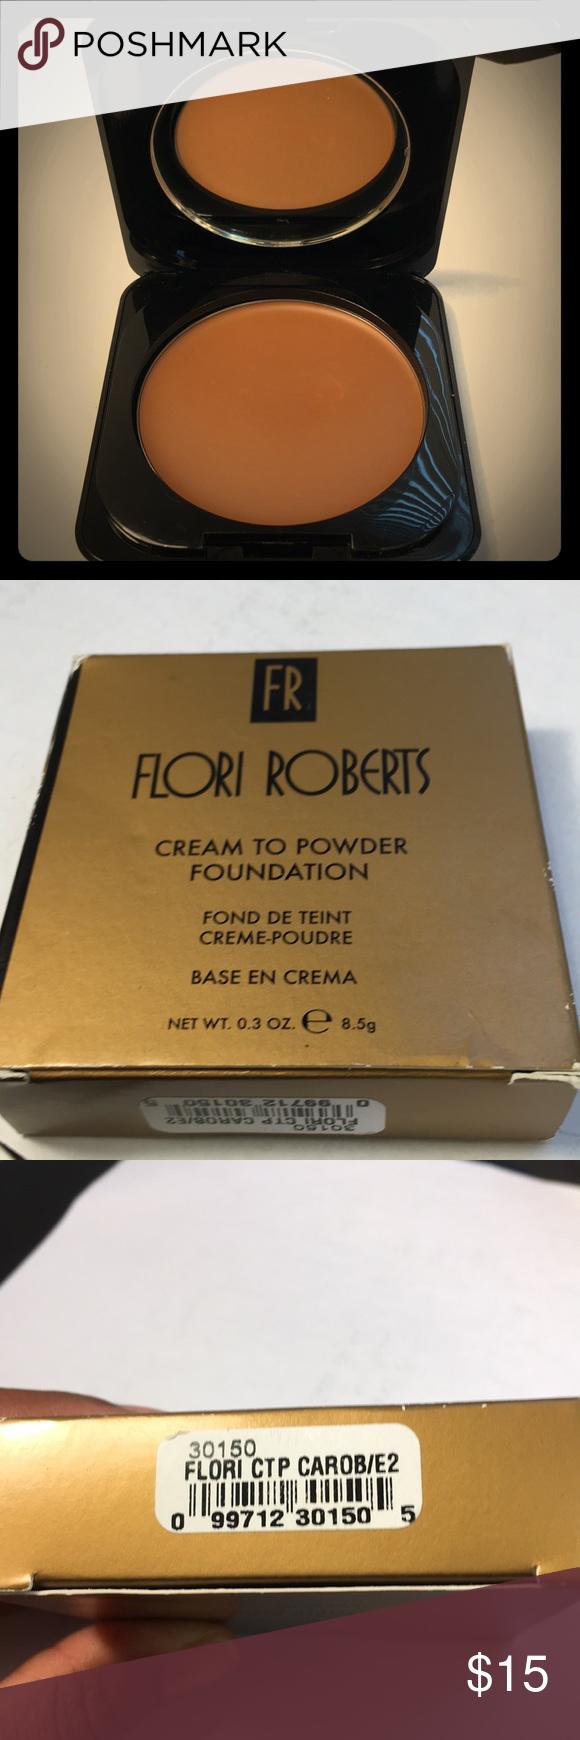 Flori Roberts Cream to Powder Foundation Light weight